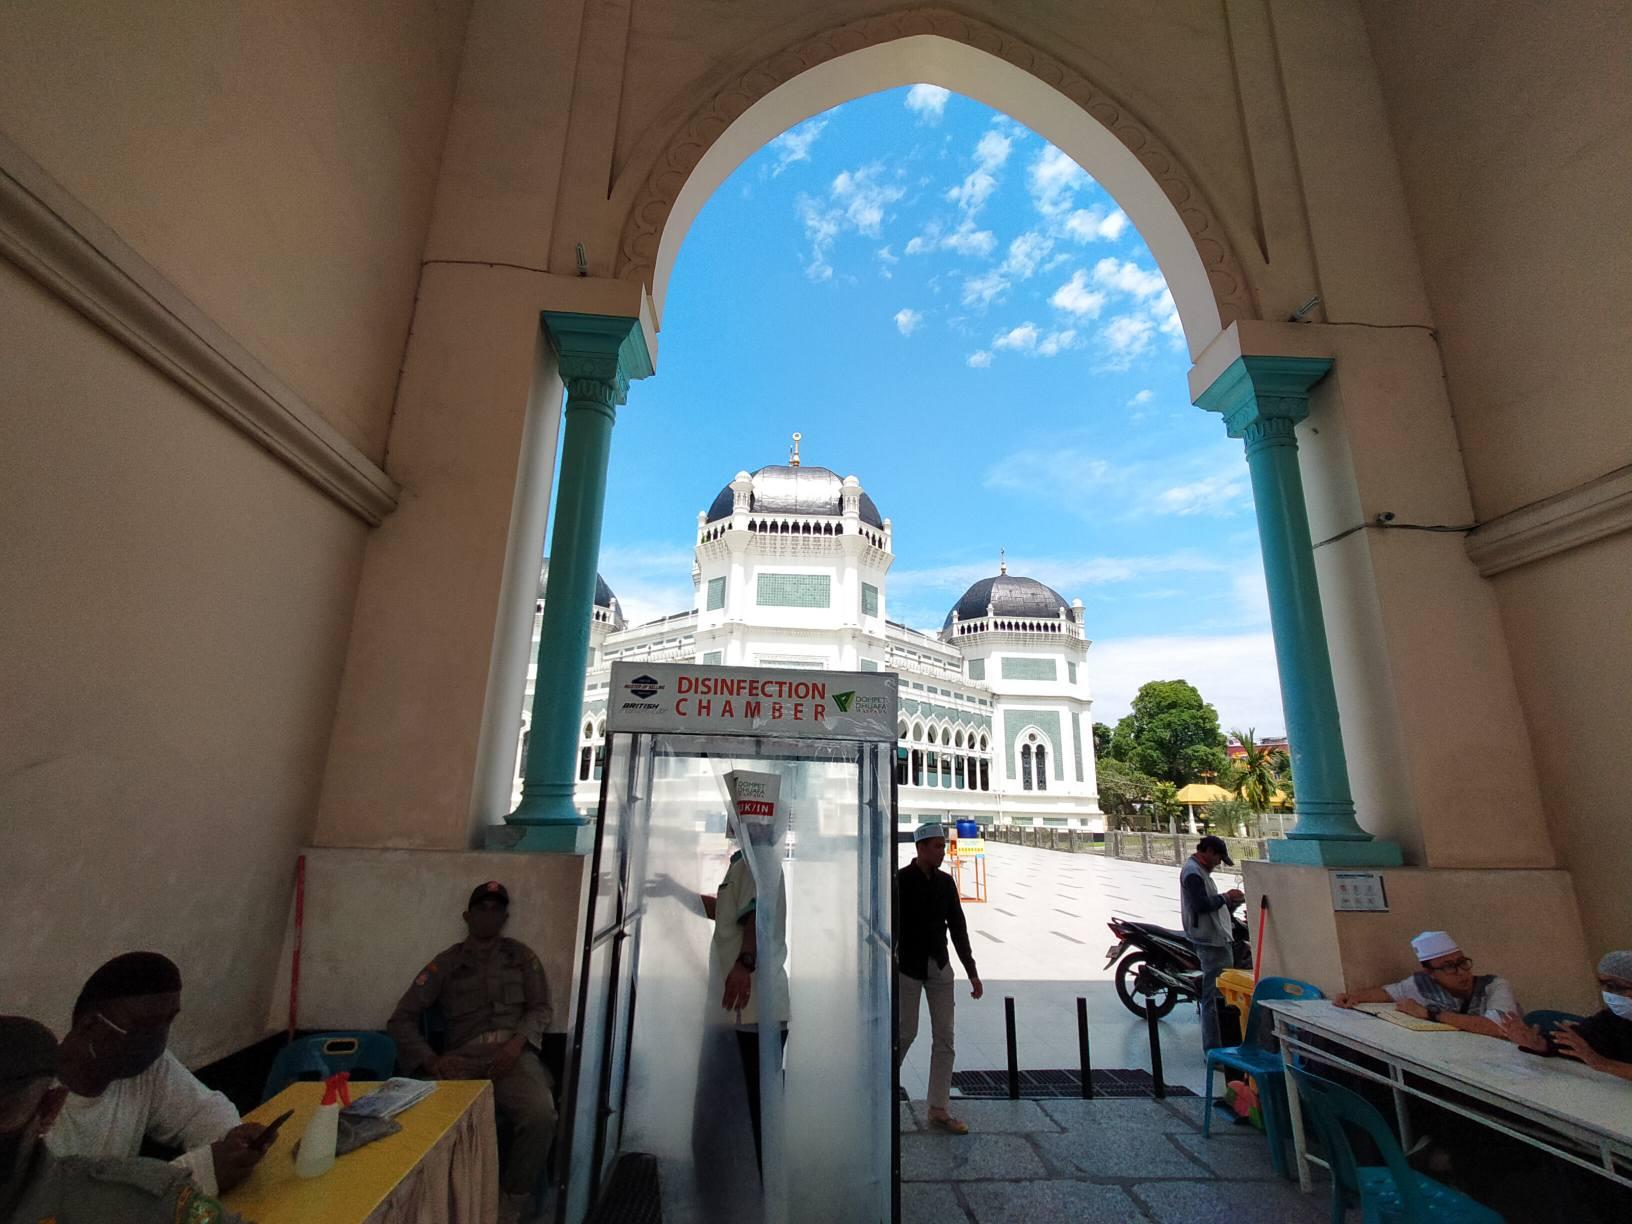 Persiapan Masjid Raya Medan Jelang Hari Raya Idul Fitri, Seluruh Areal Disemprot Disinfektan